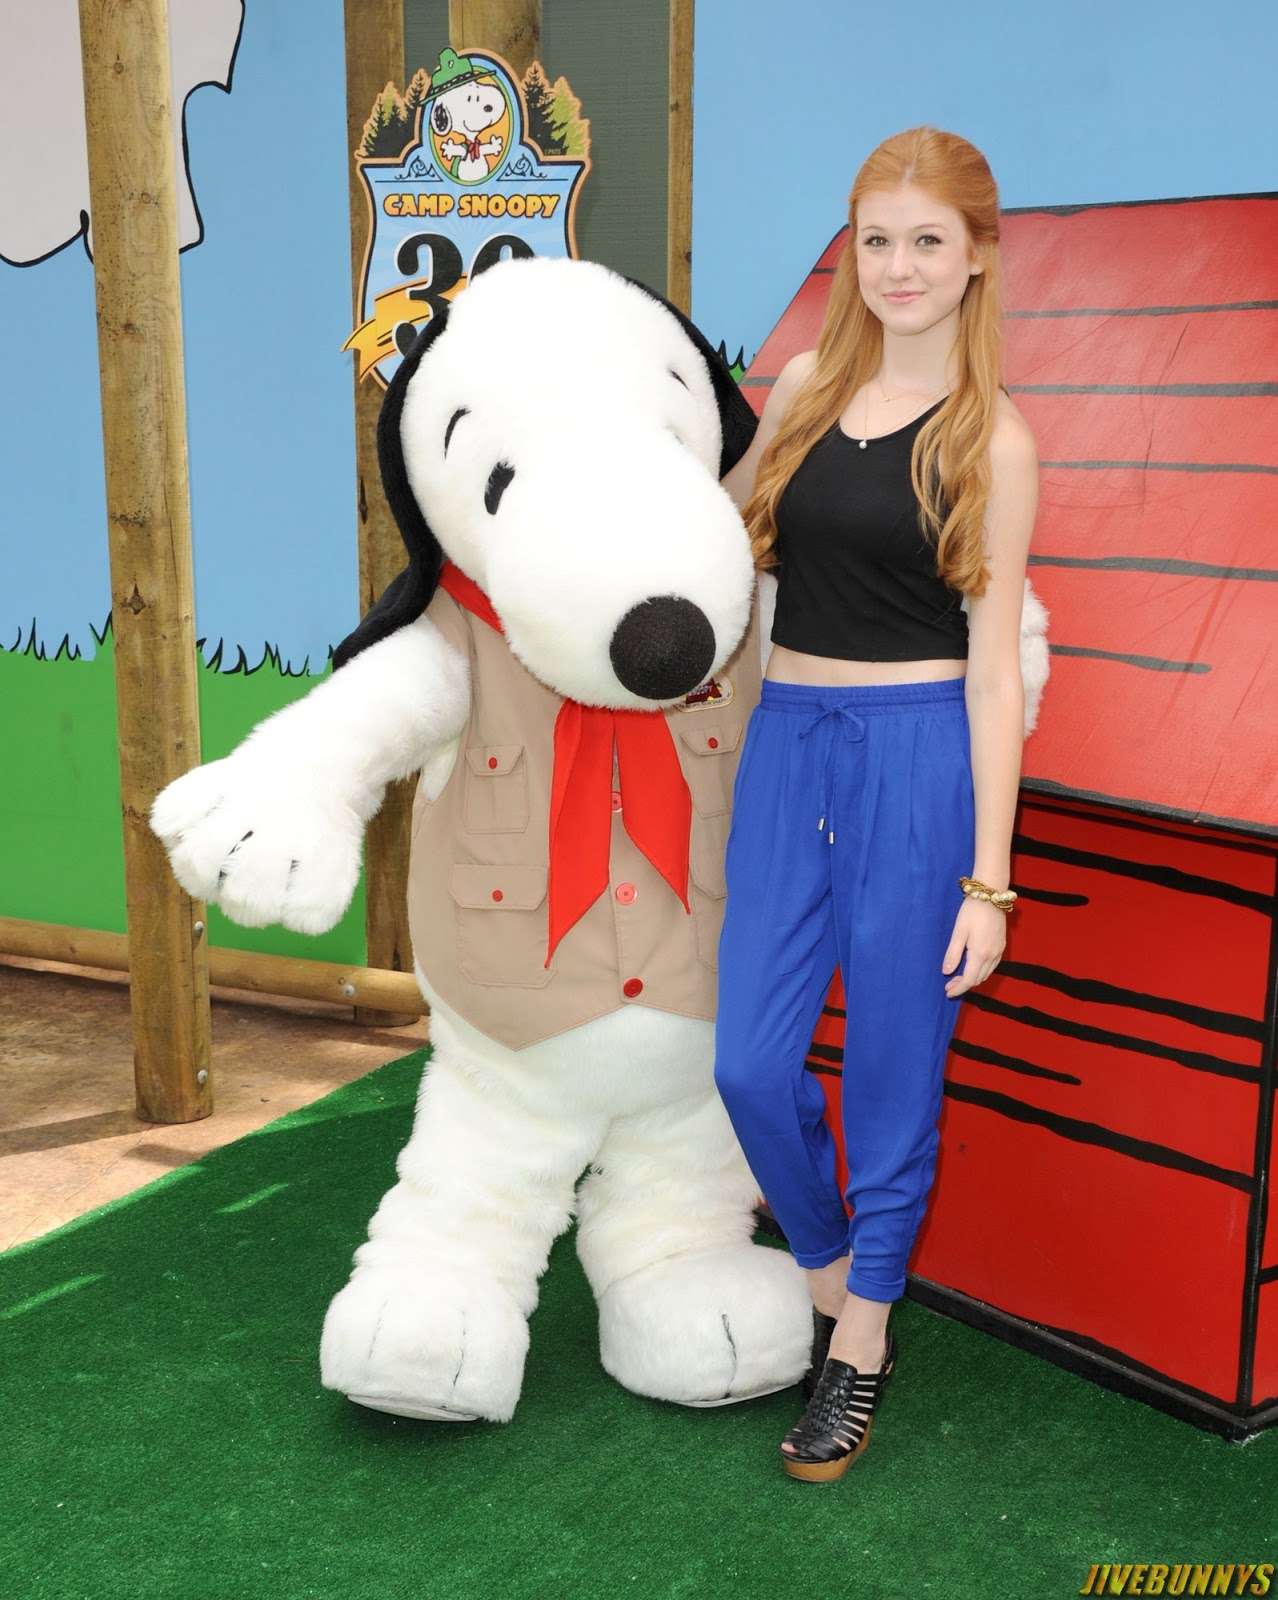 Katherine McNamara at Camp Snoopy's 30th Anniversary VIP Party at Knott's Berry Farm in Buena Park 6/26/14